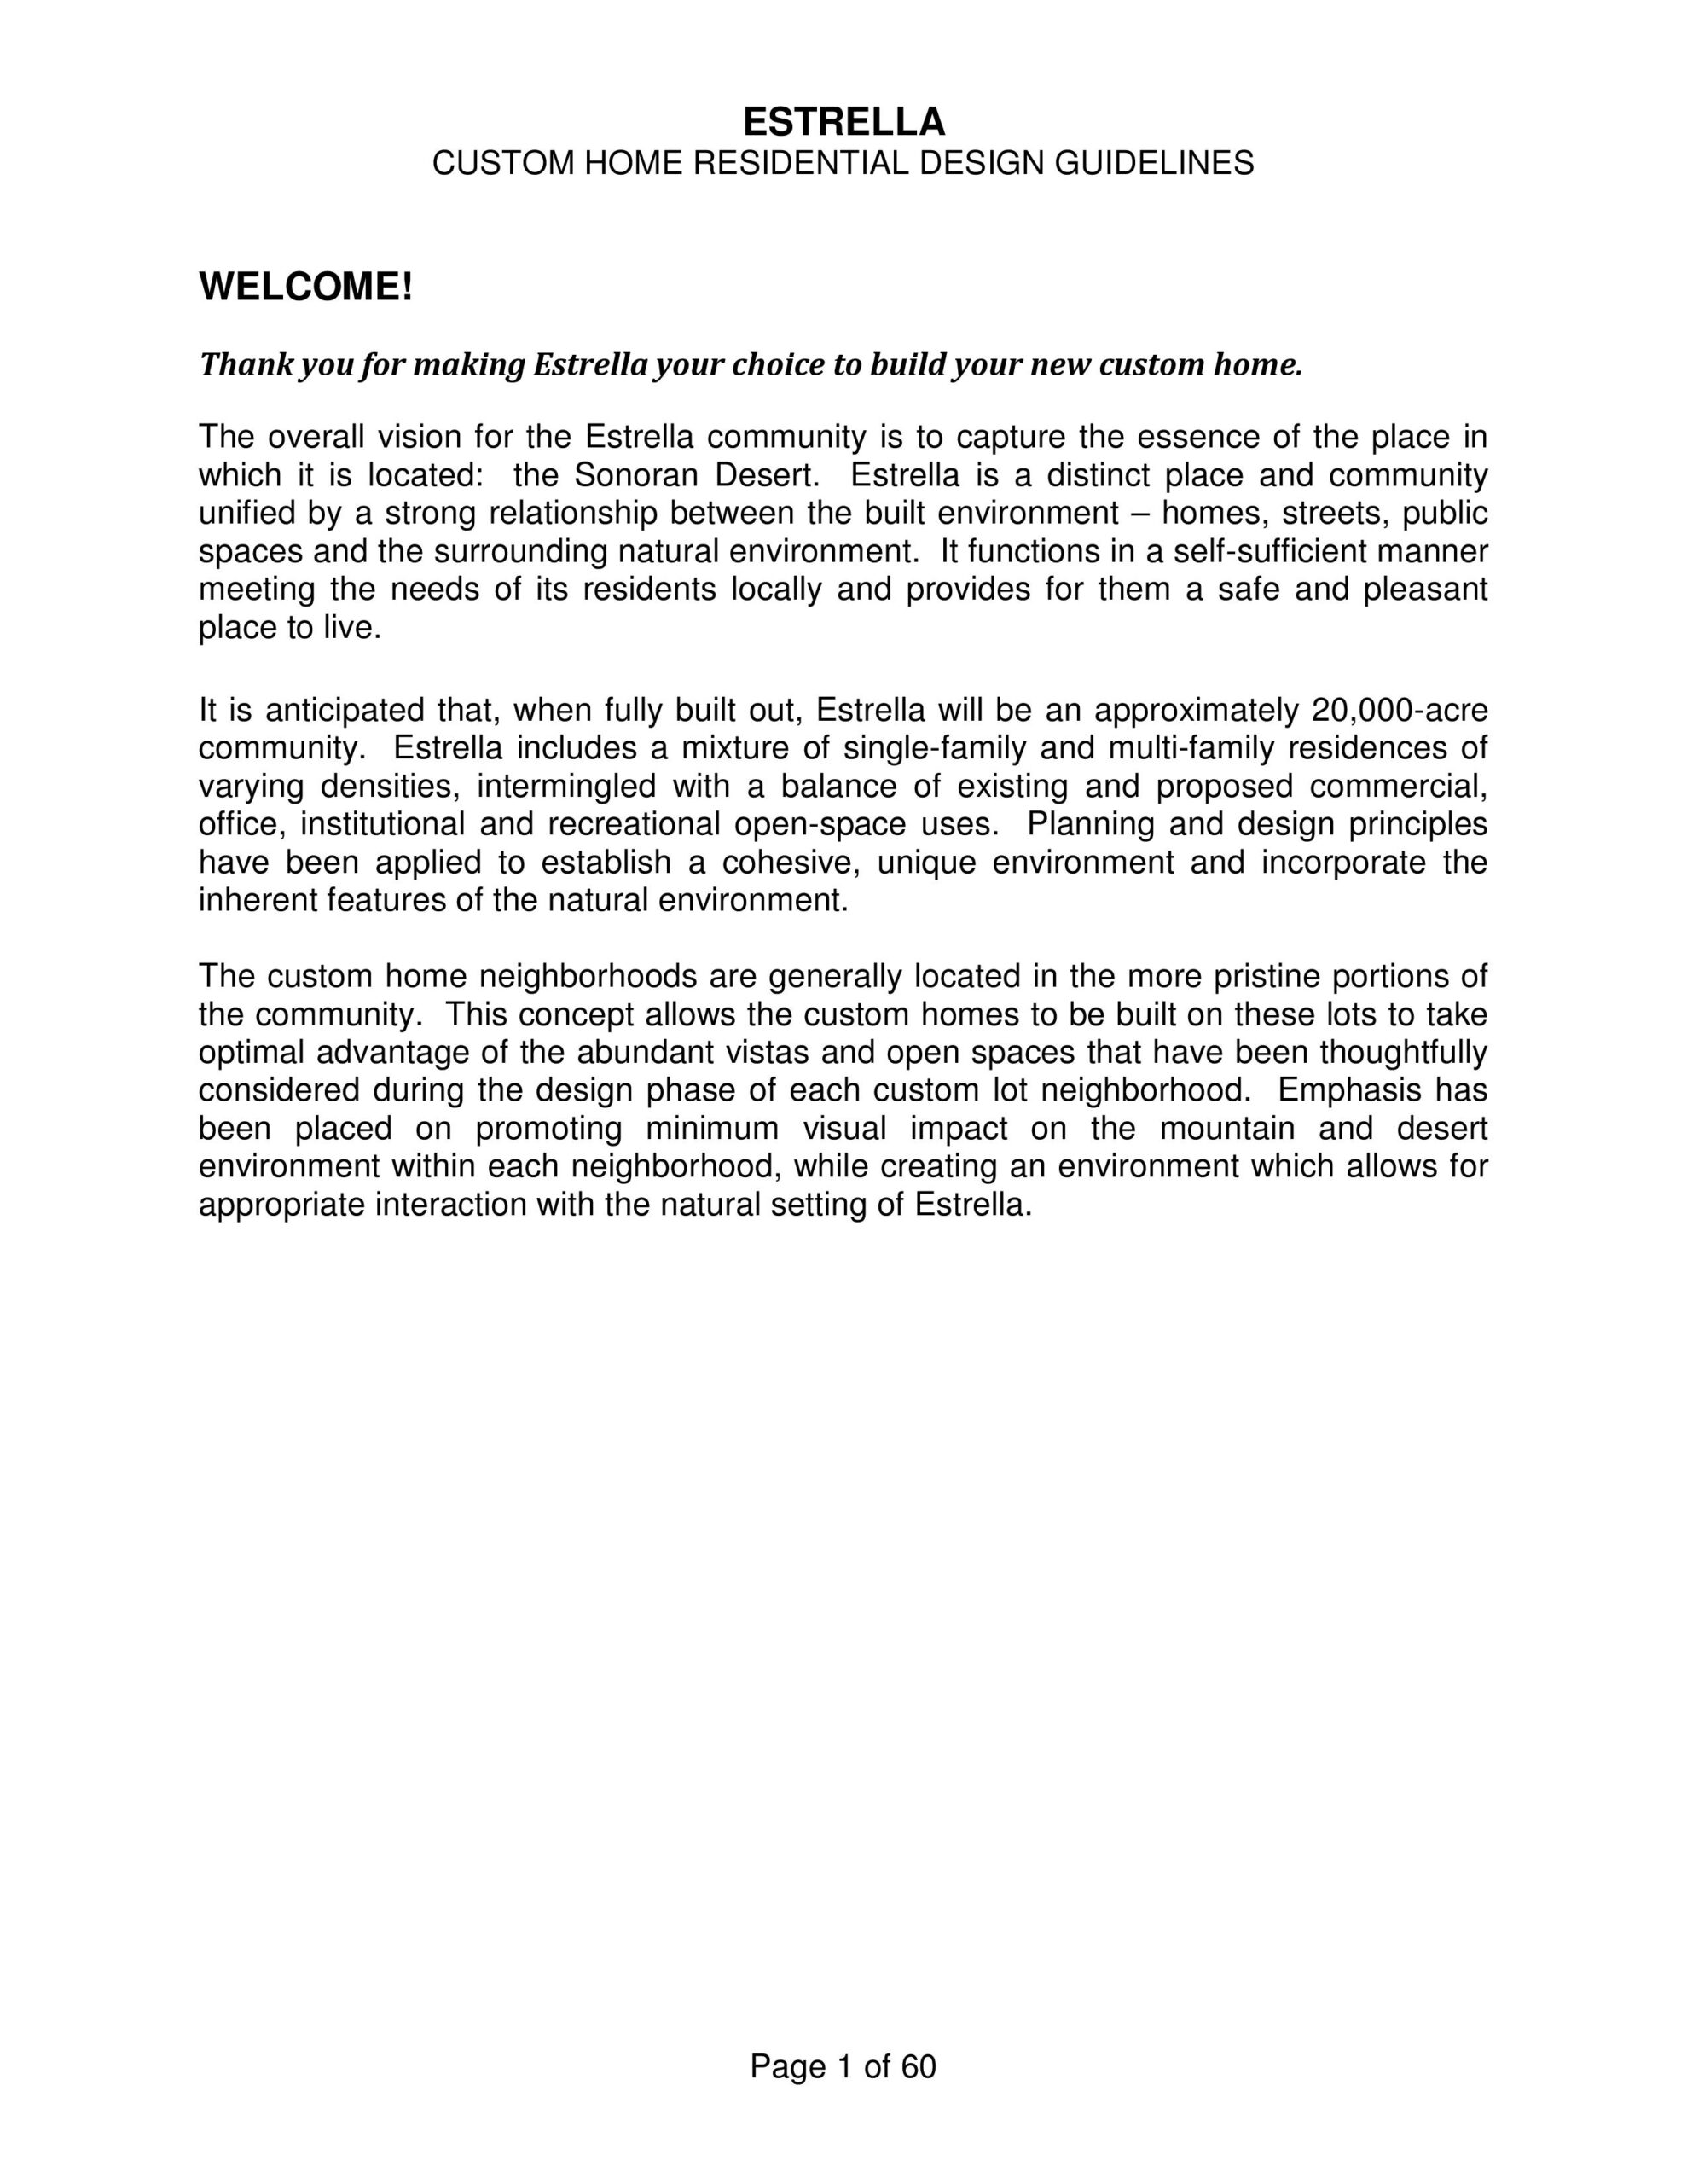 ESTRELLA MOUNTAIN CUSTOM HOME GUIDELINES-page-005